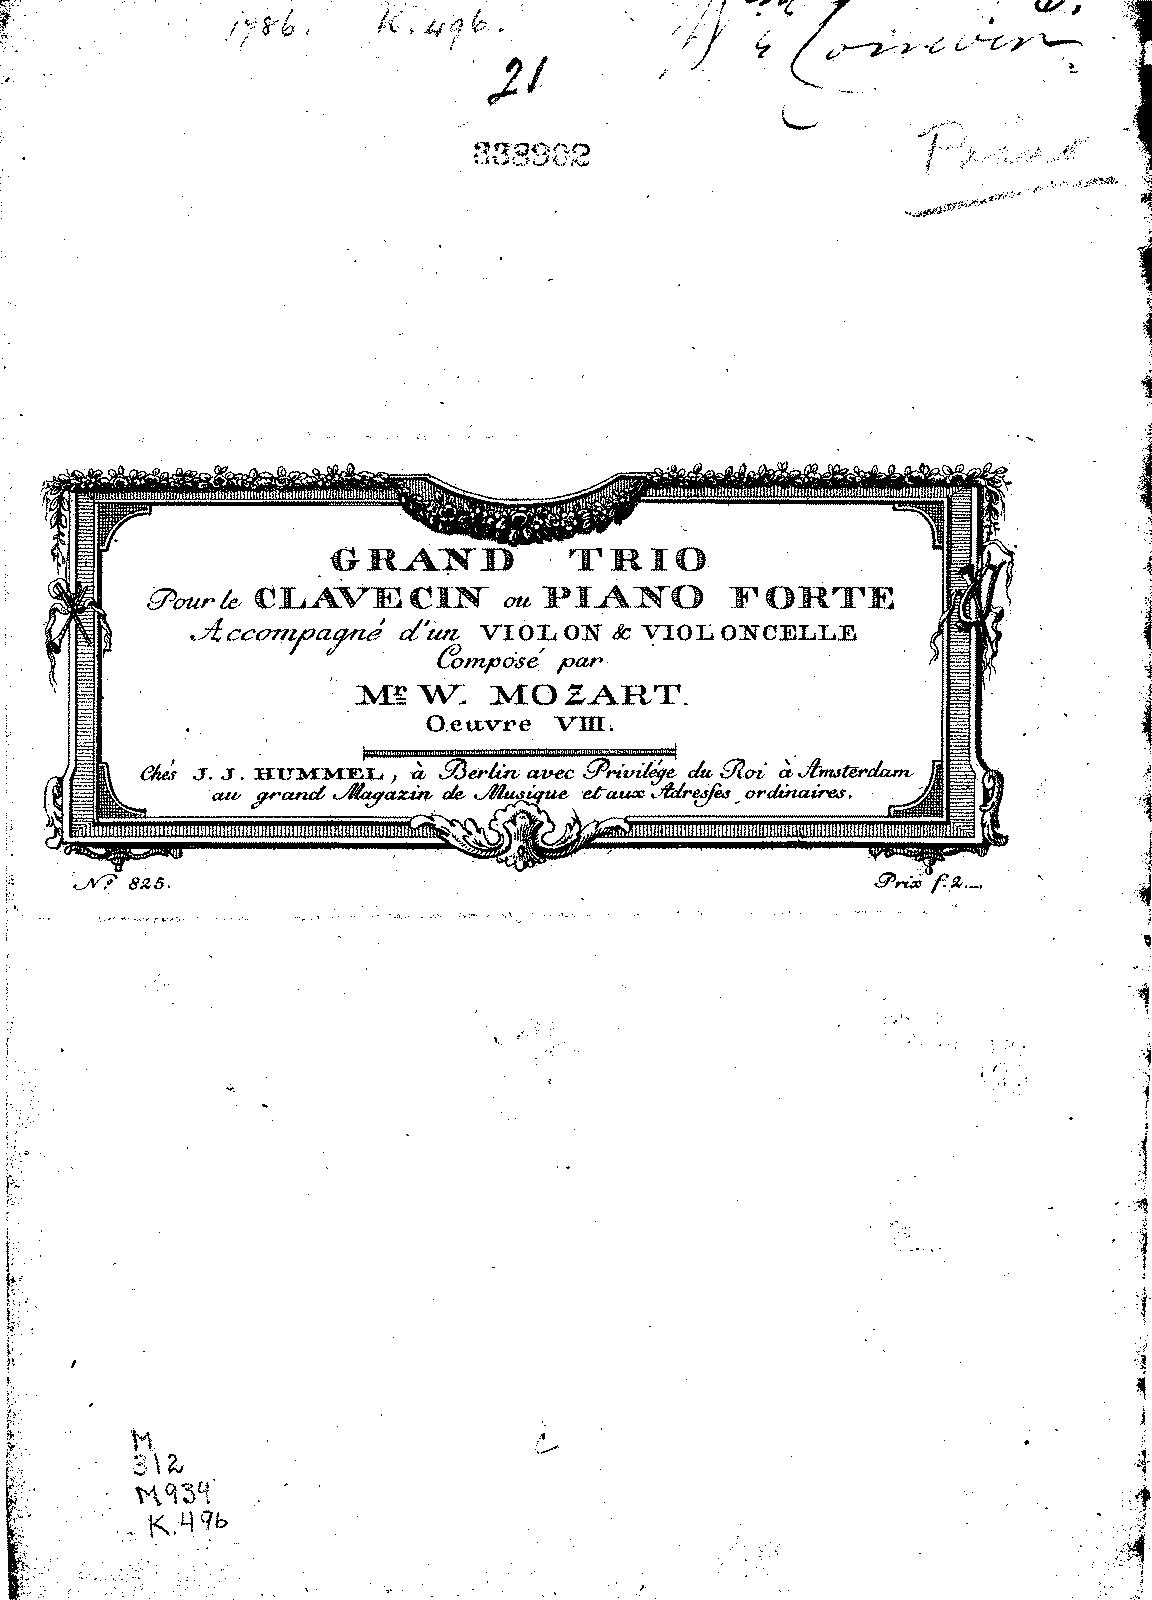 Piano Trio in G major, K.496 (Mozart, Wolfgang Amadeus) - IMSLP ...